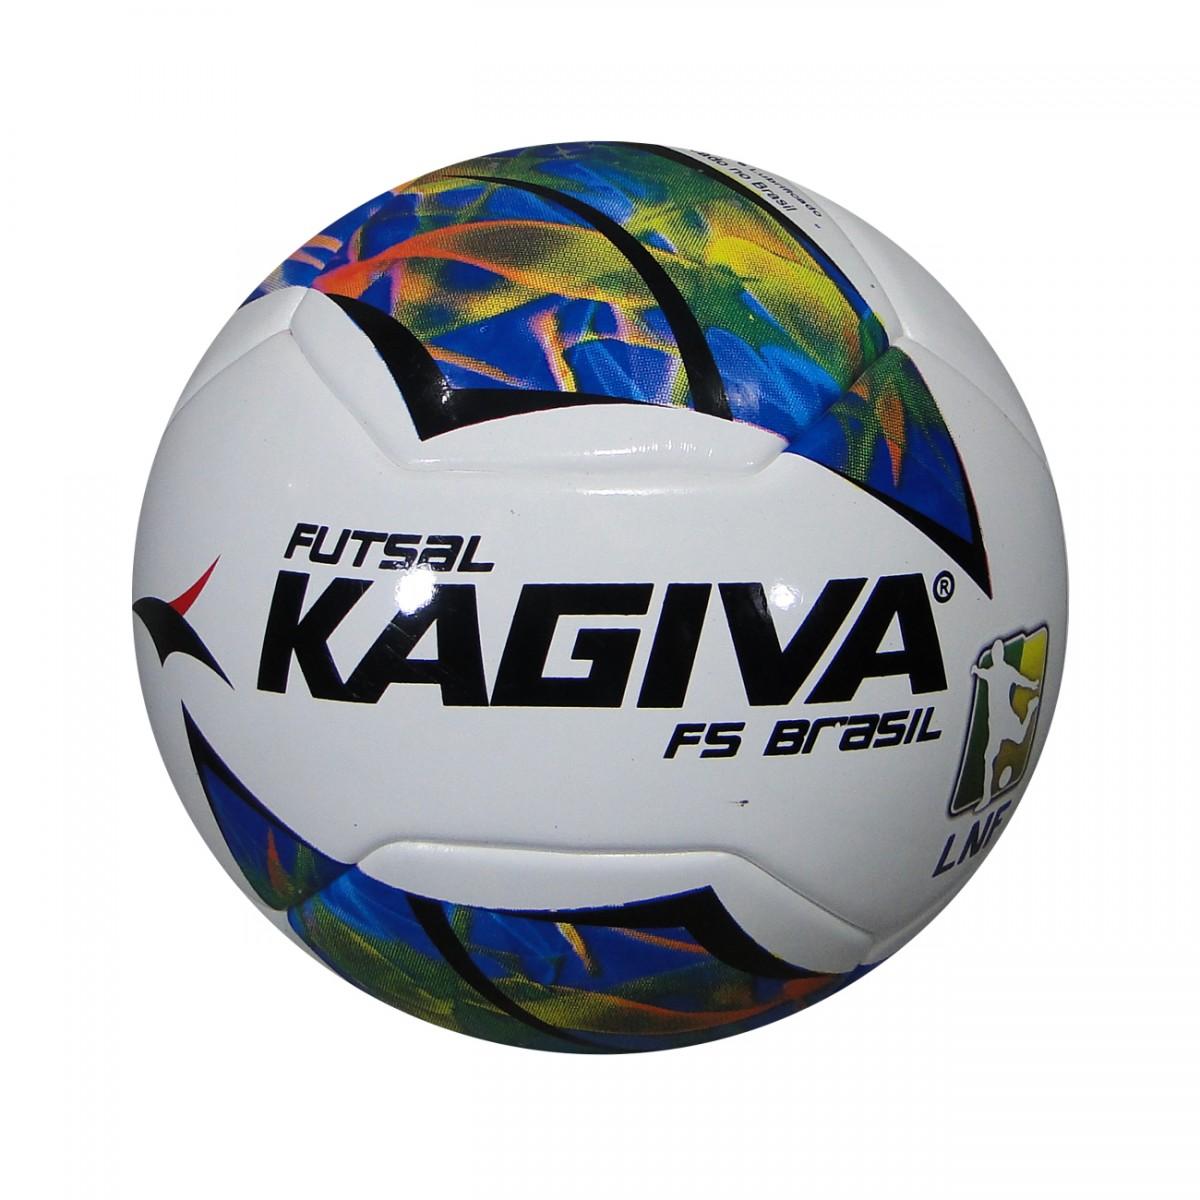 de00a1efa7 Bola Kagiva F5 Brasil Futsal 0044 - Branco Multicolor - Chuteira ...